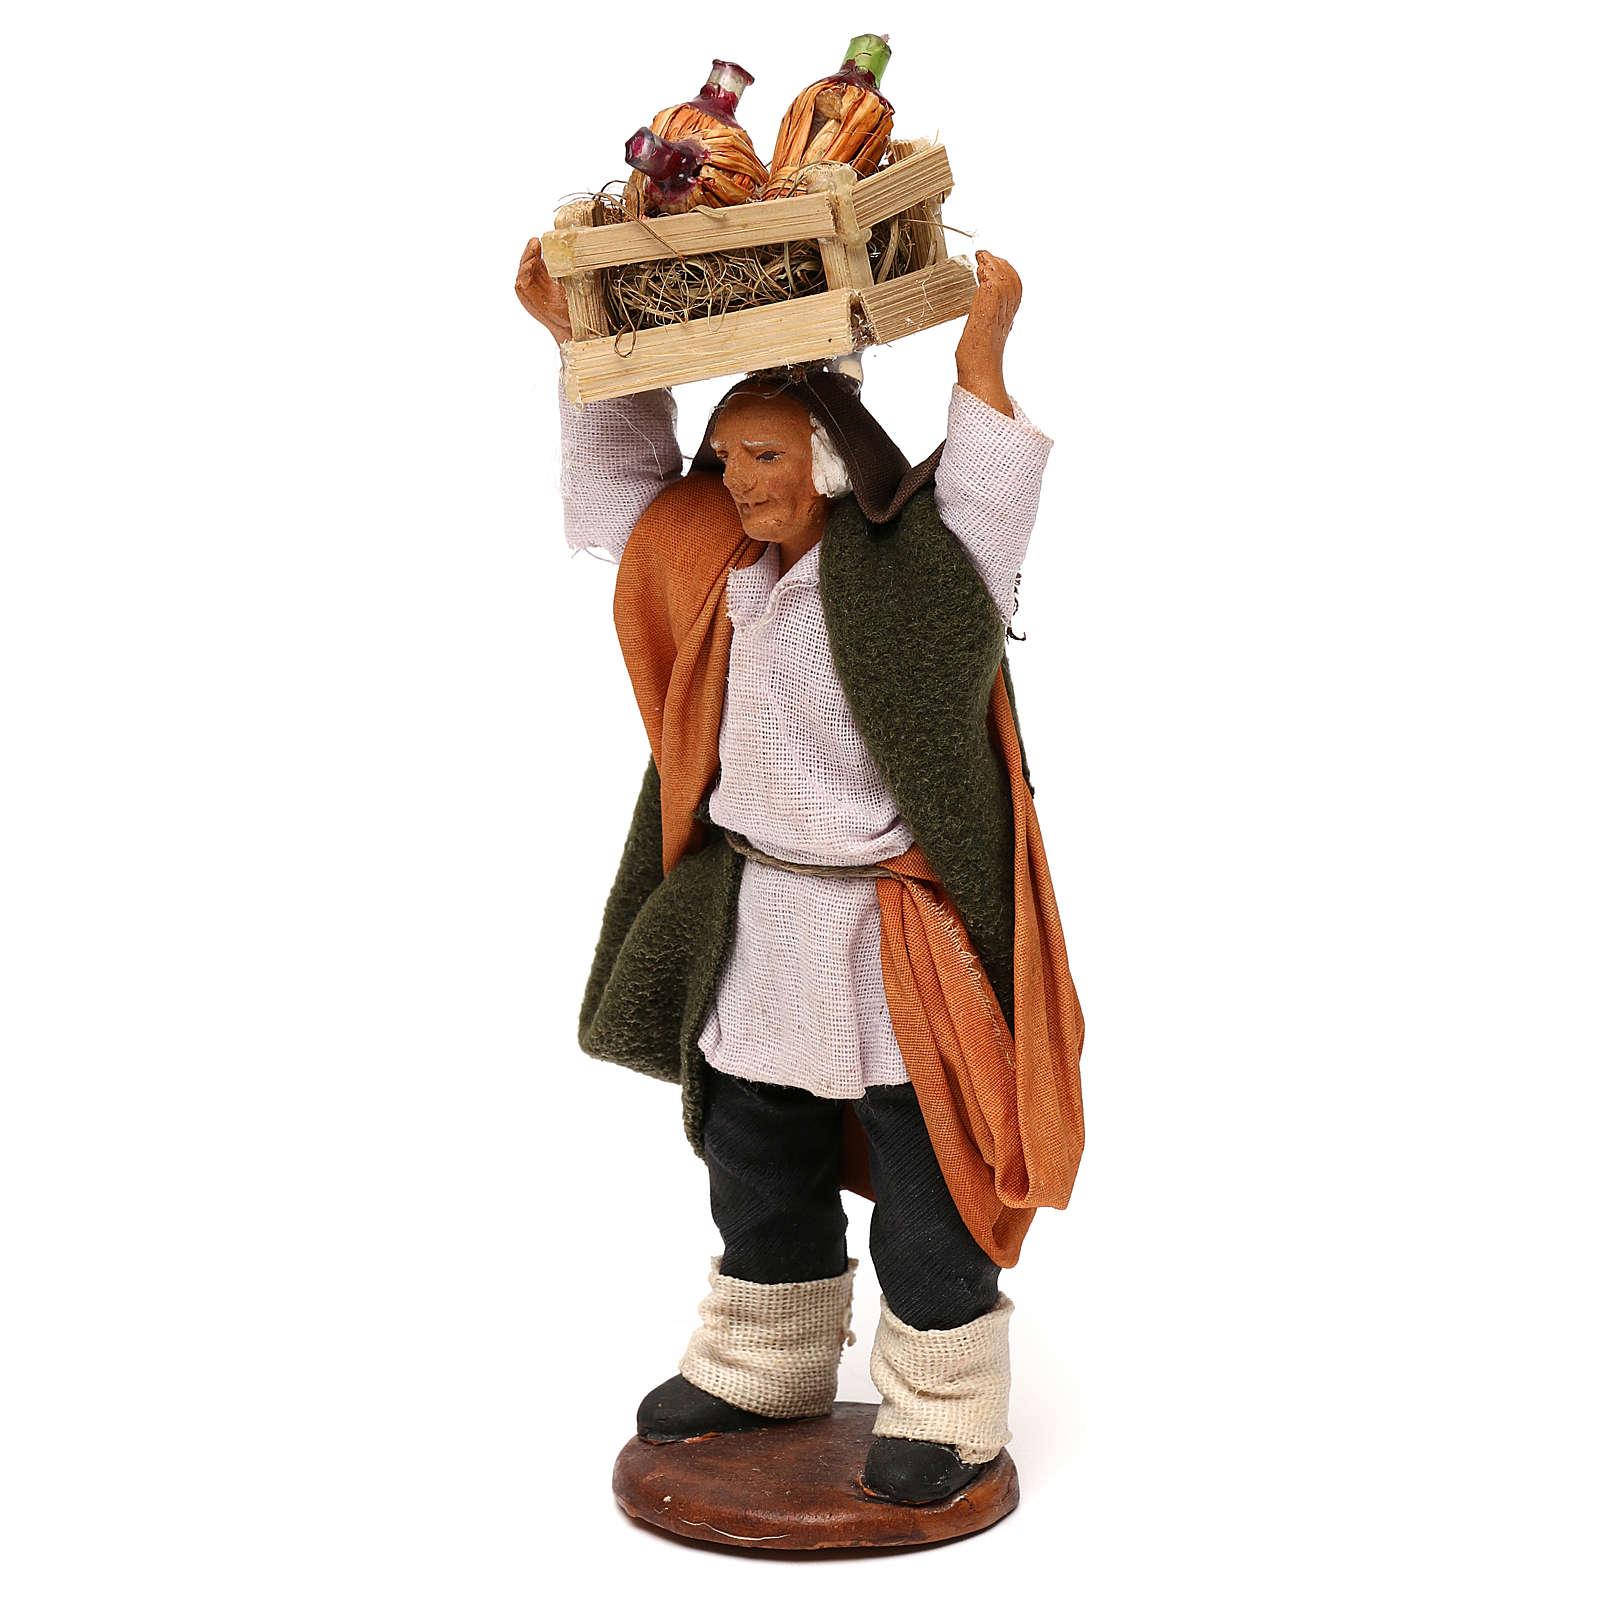 STOCK Merchant with bottles, Neapolitan Nativity scene 12 cm 4